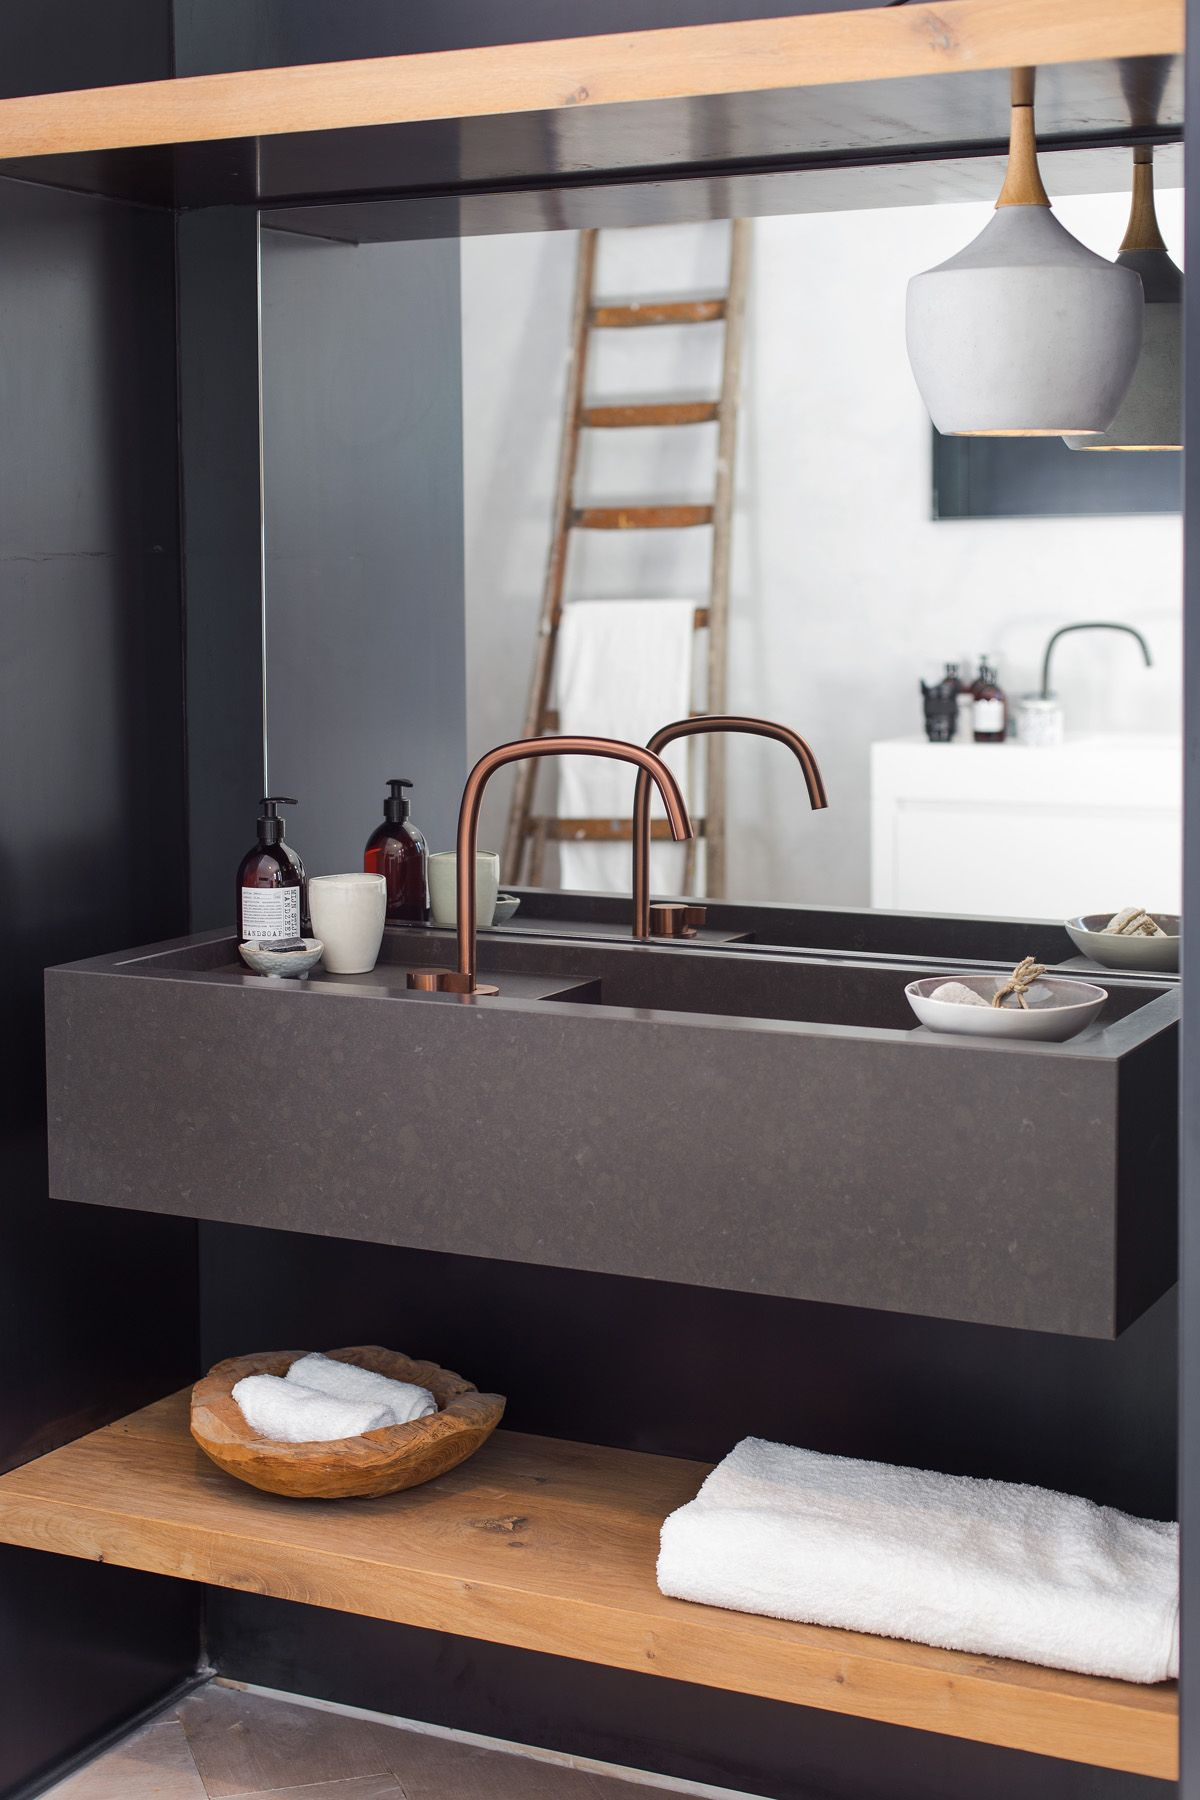 Piet Boon koperen design badkamer kranen bycocoon.com | Piet Boon ...